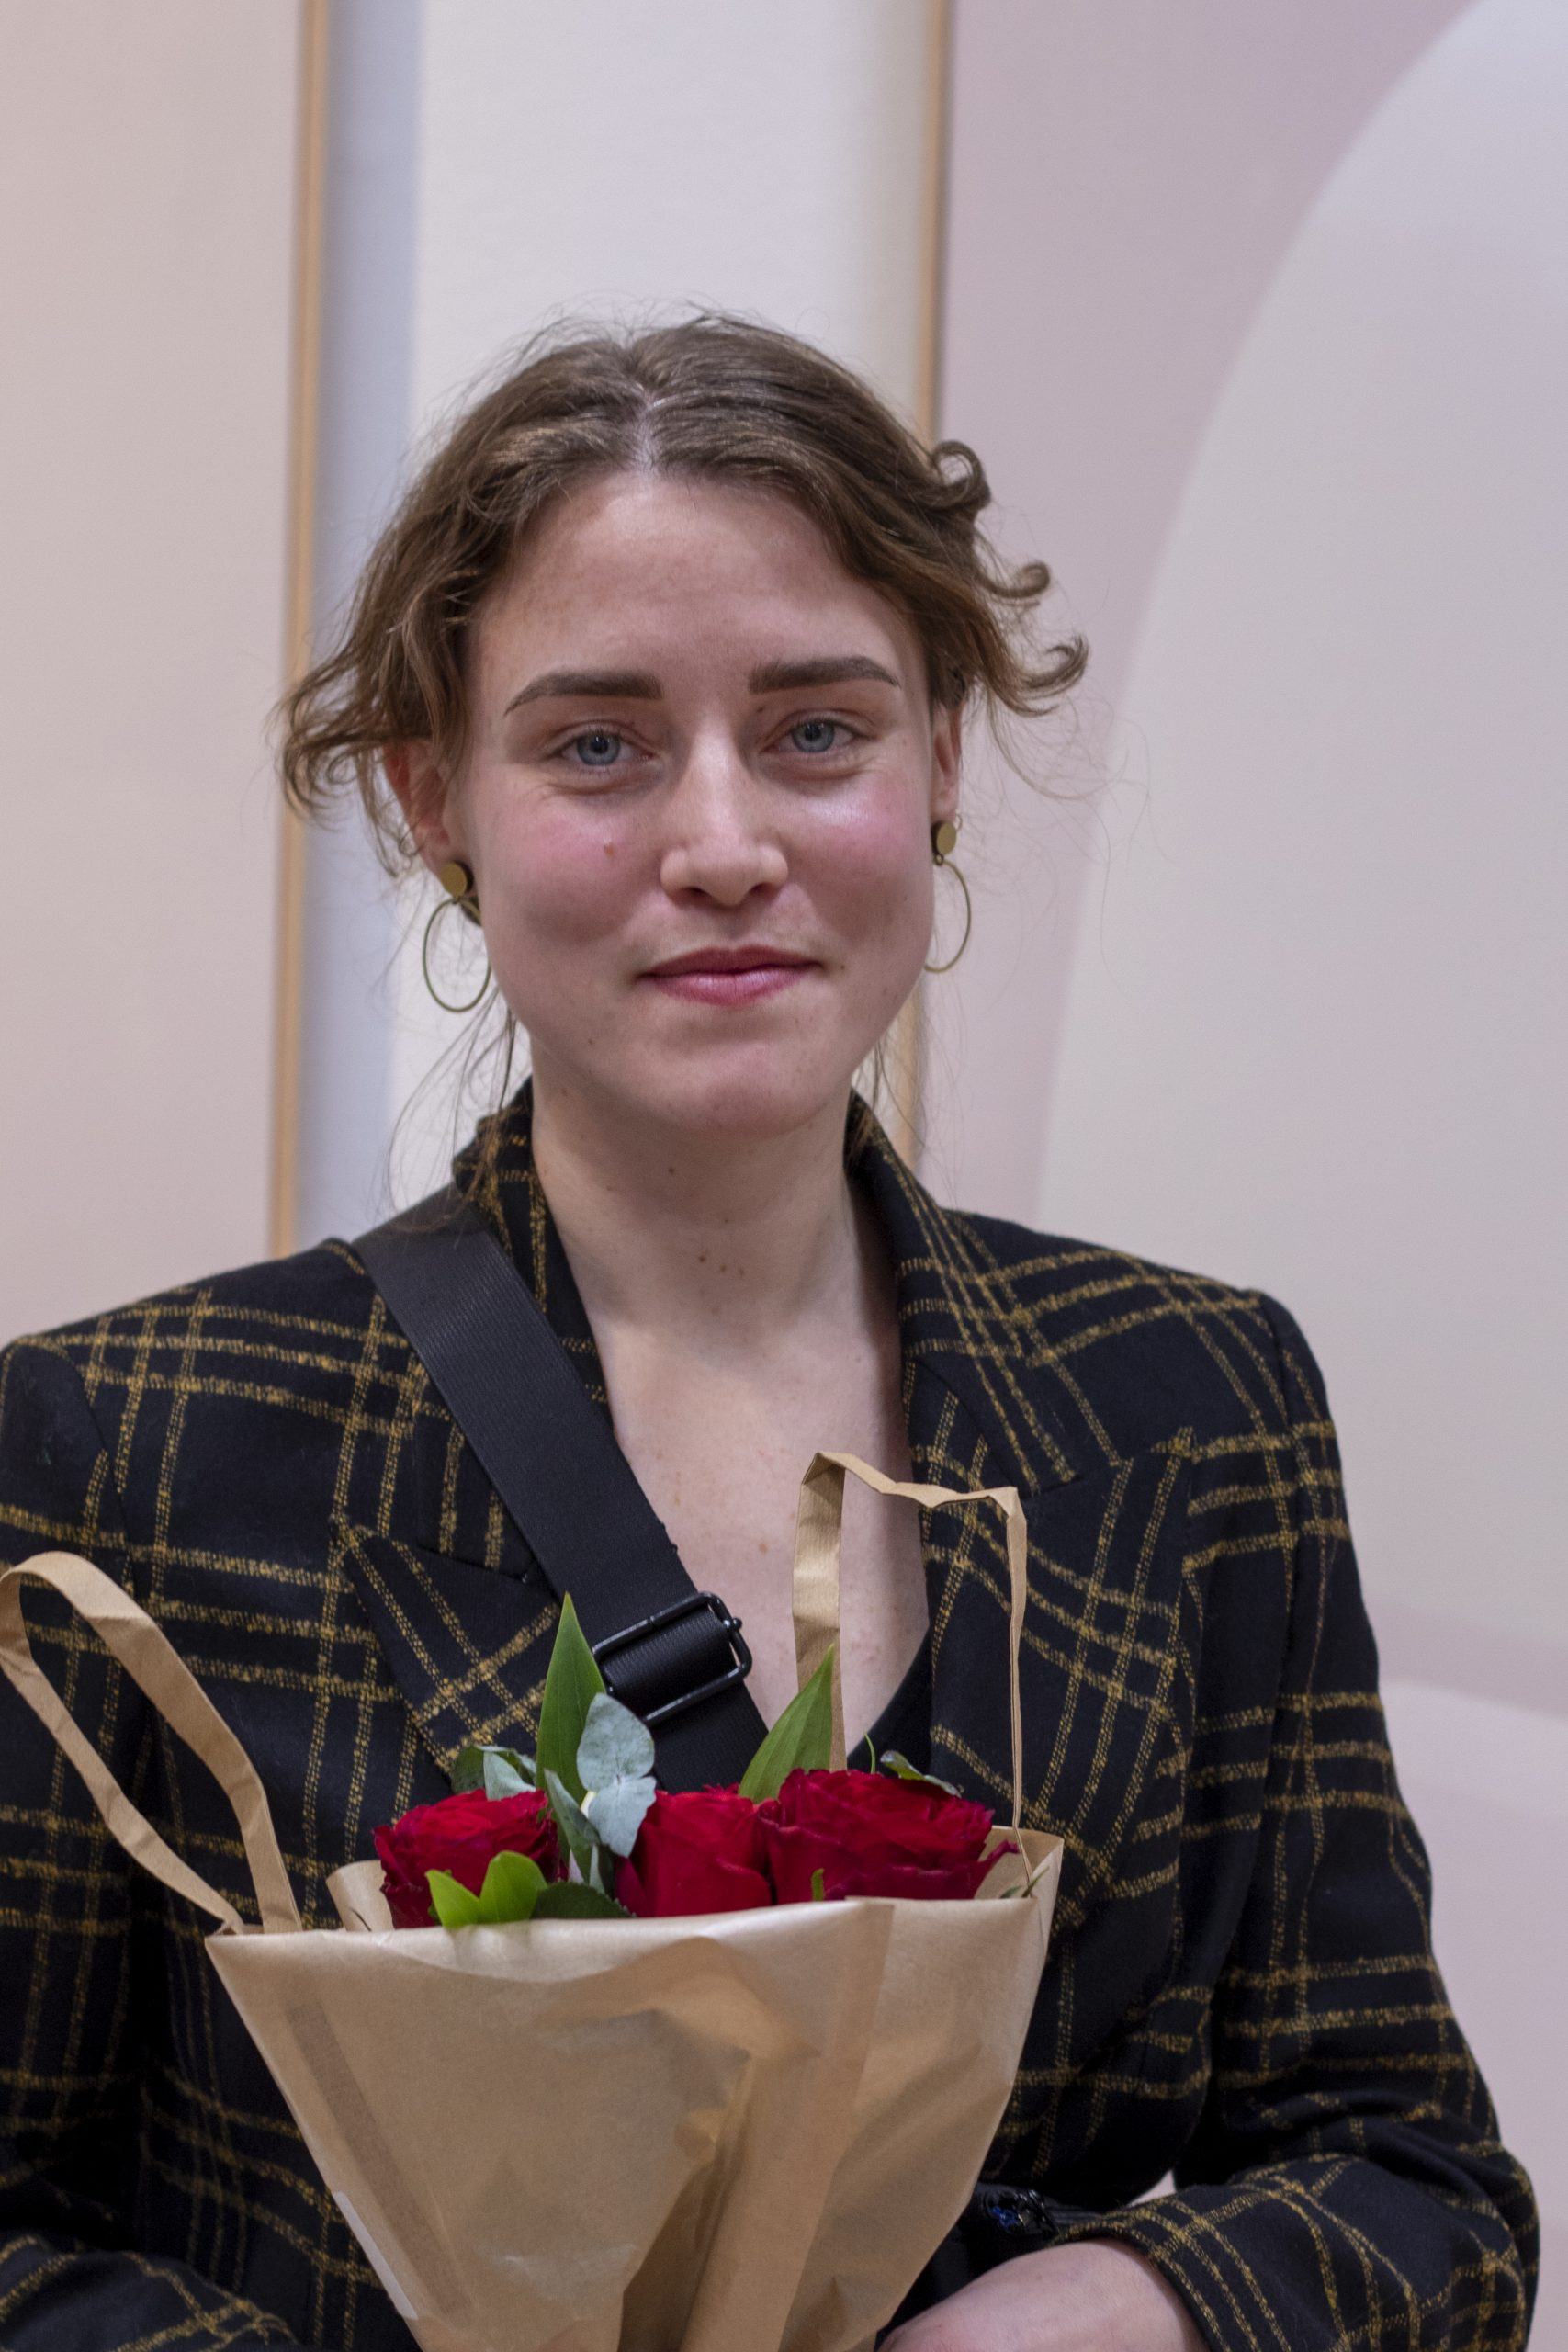 Porträttfoto Elin Odentia, stipendiat 2019